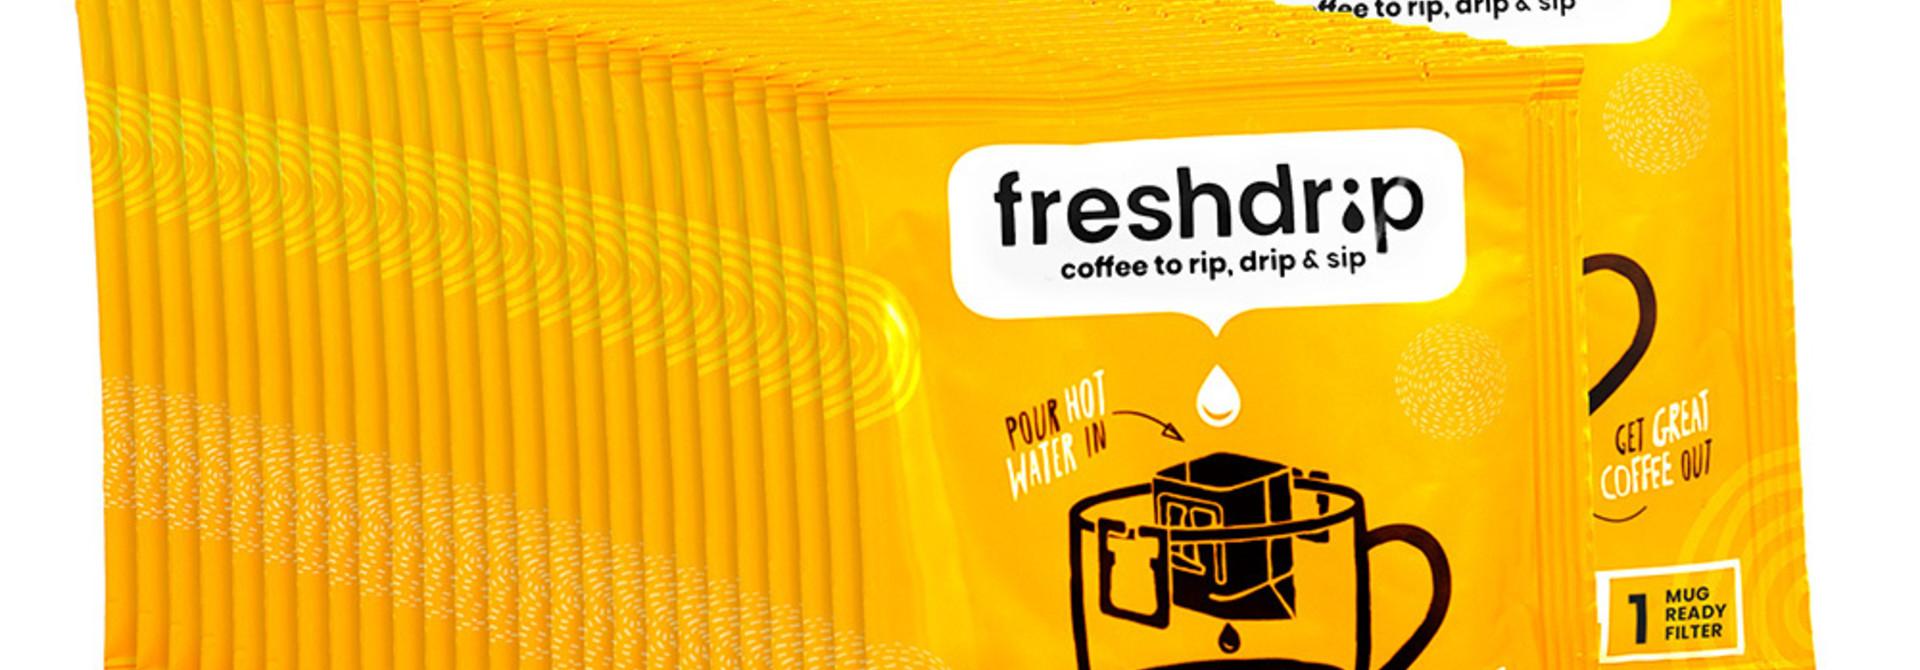 Full-strength drip coffee | Colombia | 100 Freshdrip super saver pack